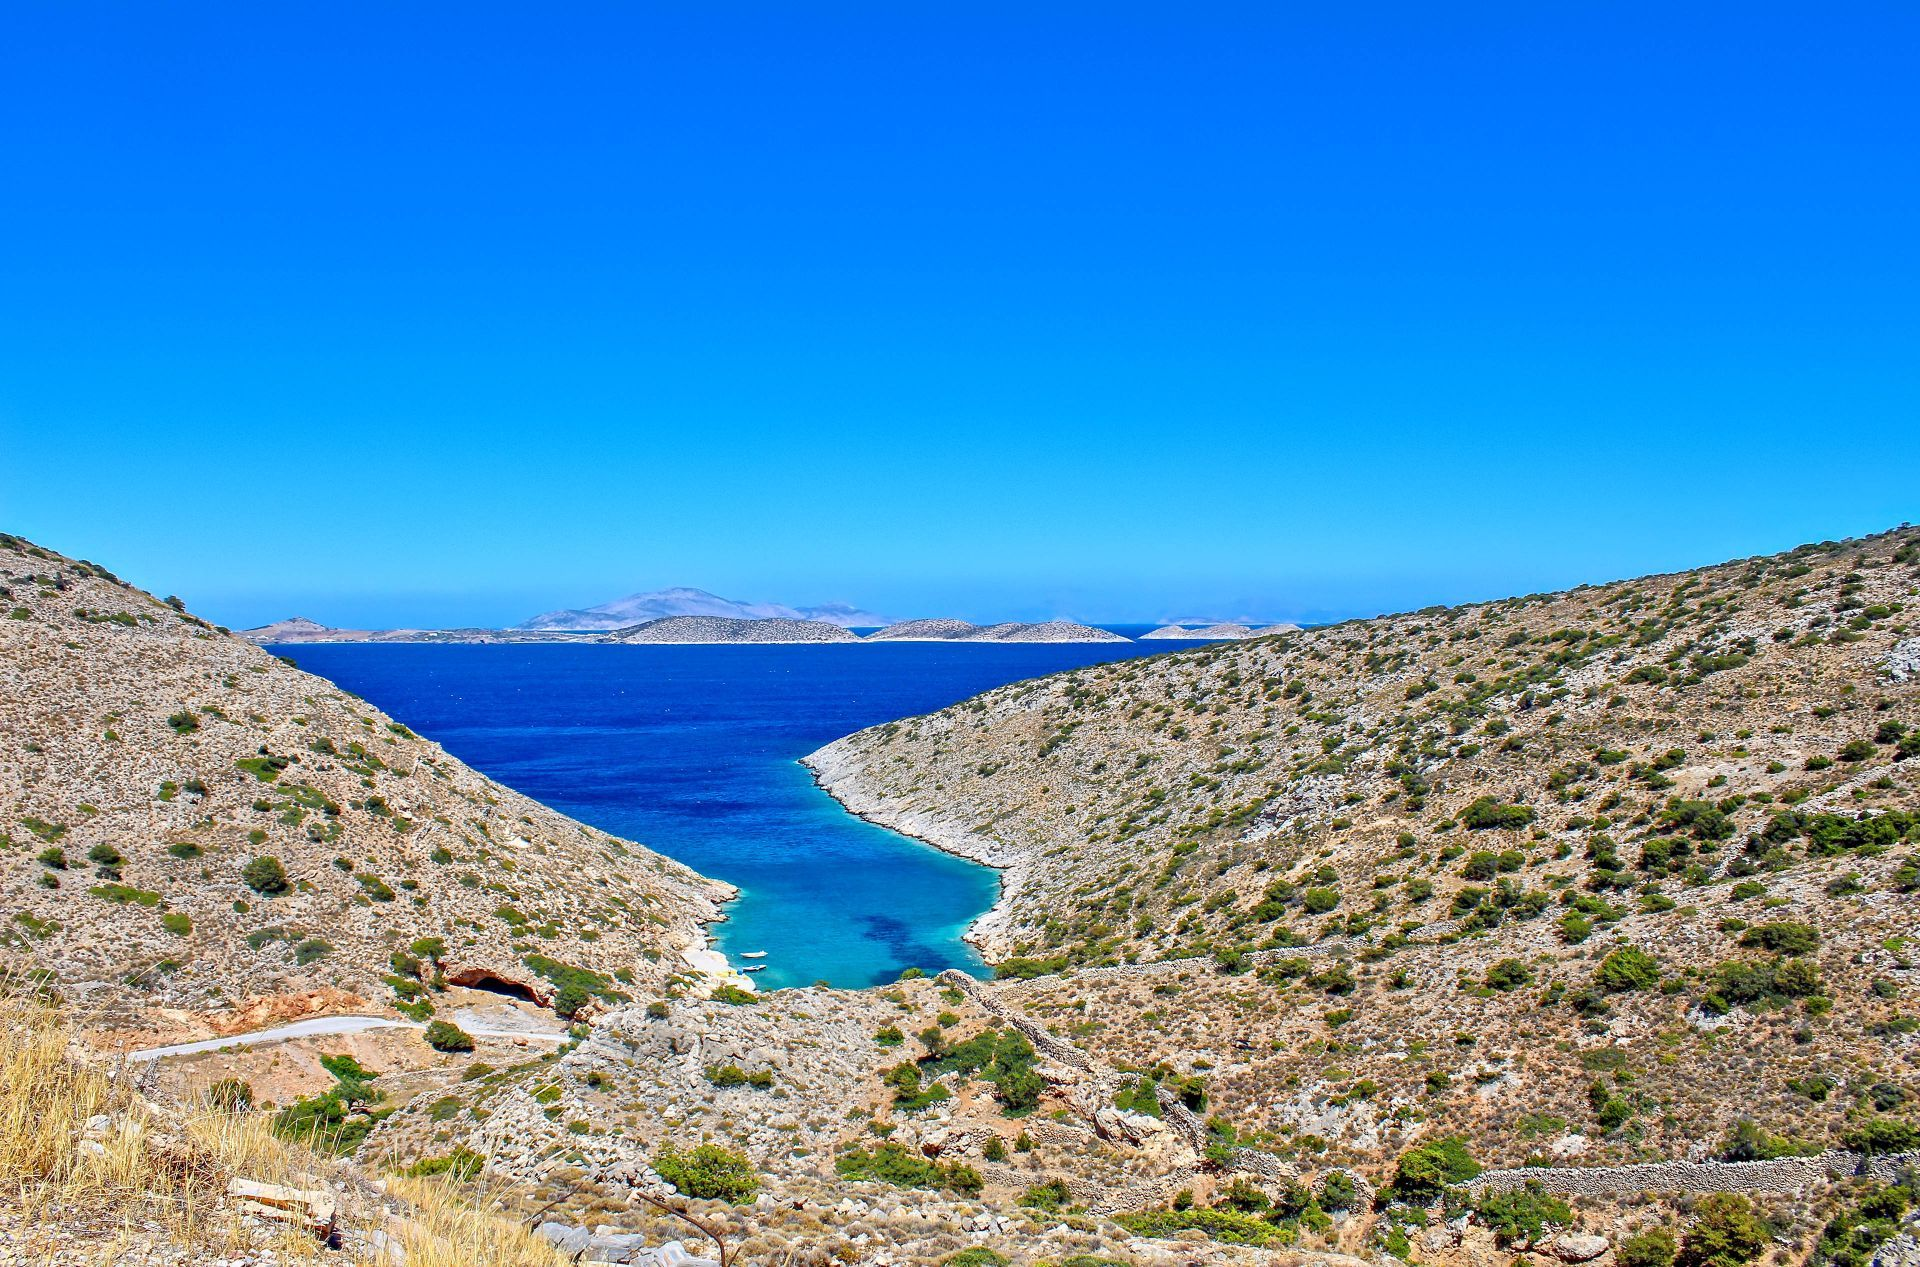 Iraklia island: Beaches